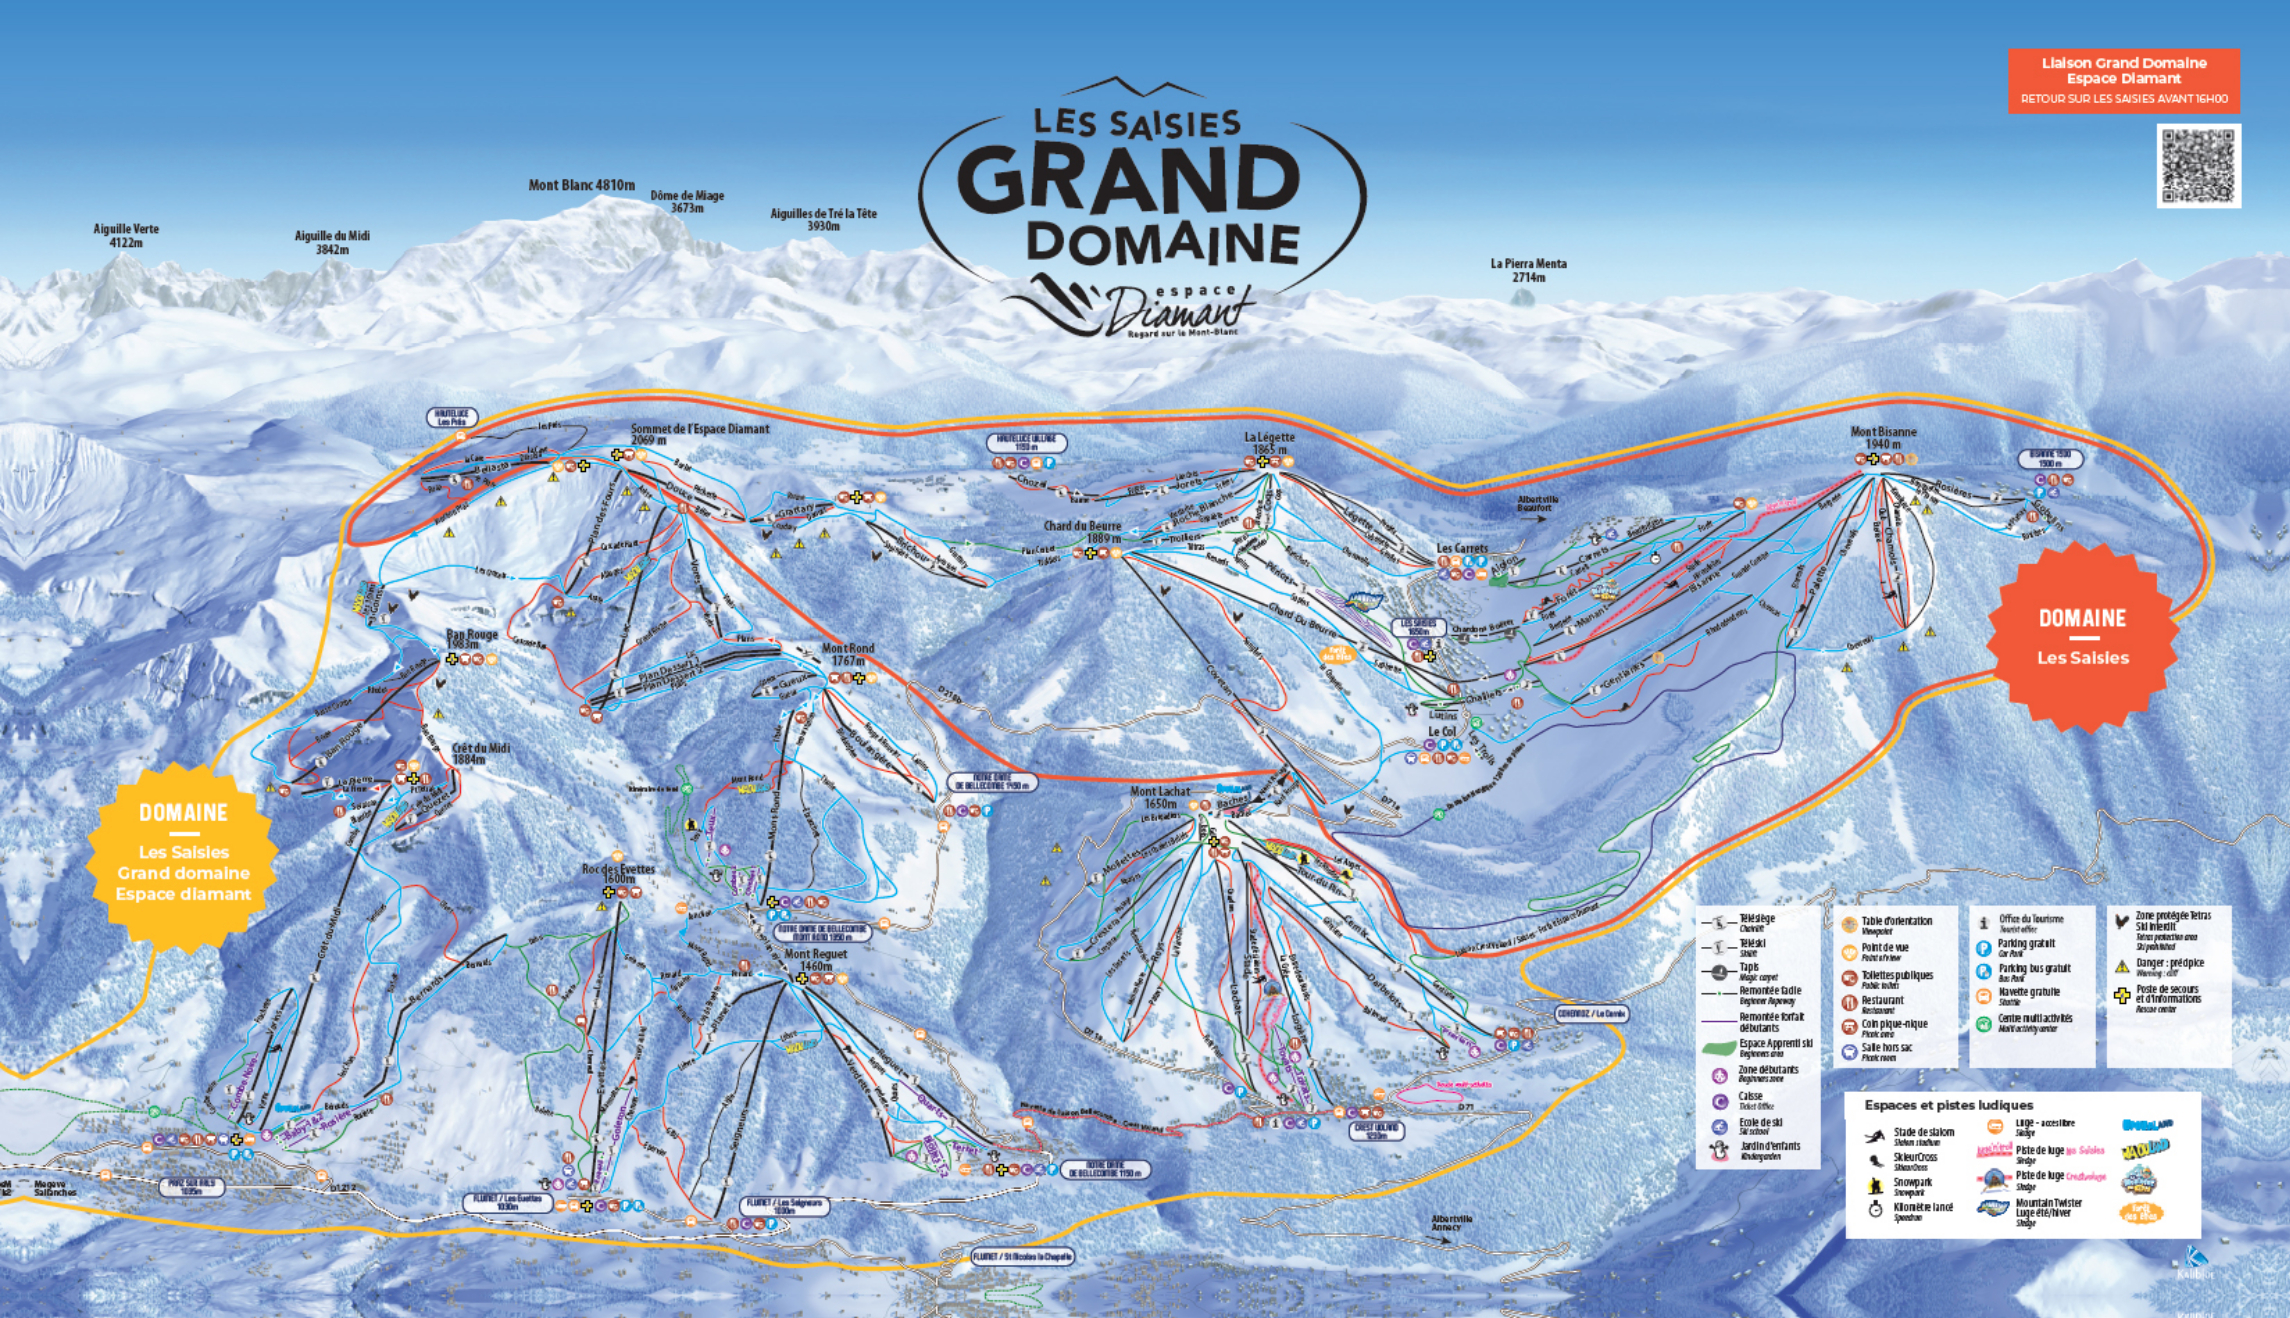 Les Saisies Piste / Trail Map